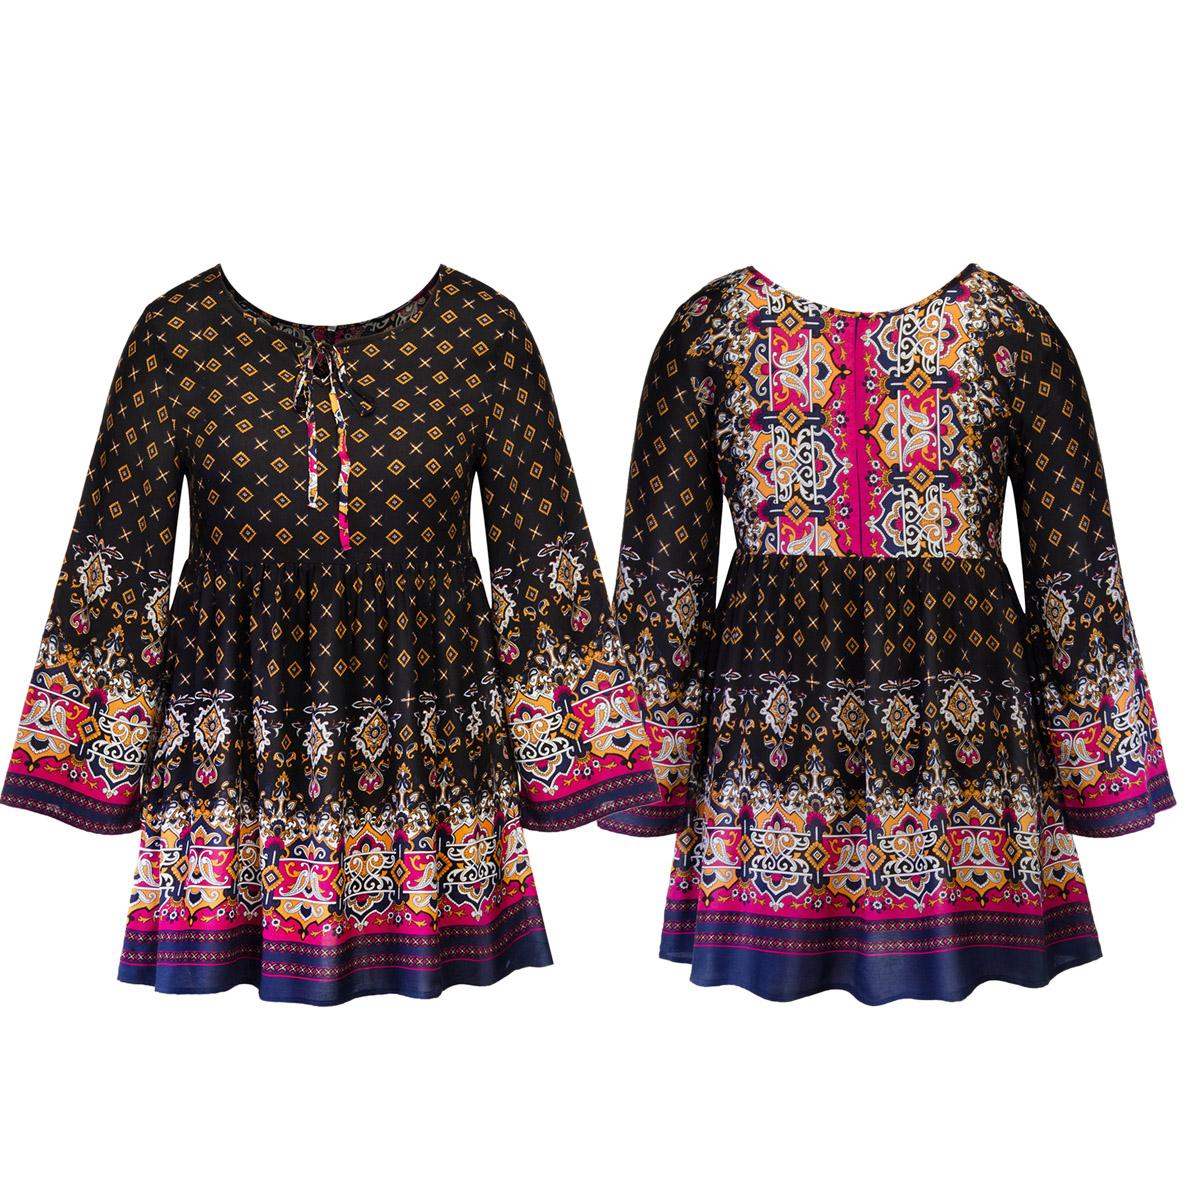 720517c17c4f Plus Size Women Long Sleeve Floral Print Boho Tunic Tops Party Short ...